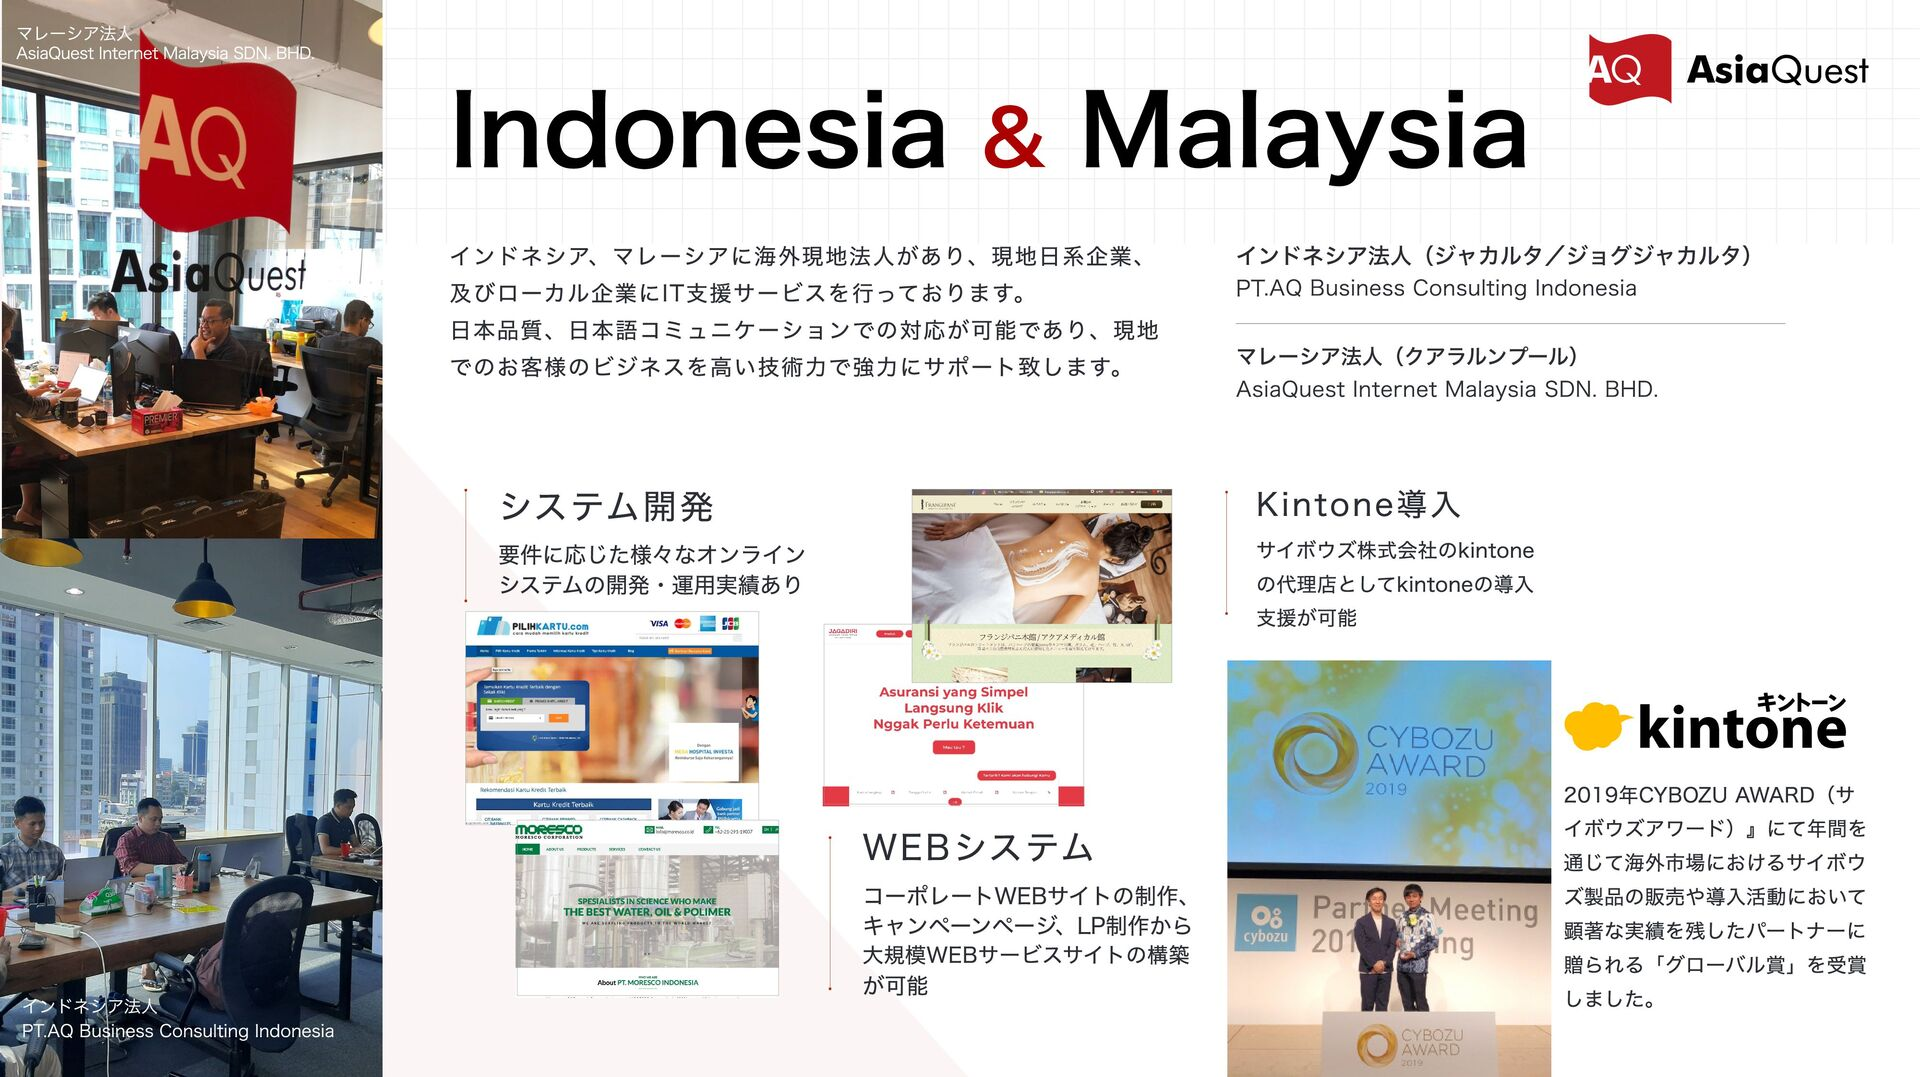 Indonesia & Malaysia インドネシア法⼈(ジャカルタ/ジョグジャカルタ) シ...